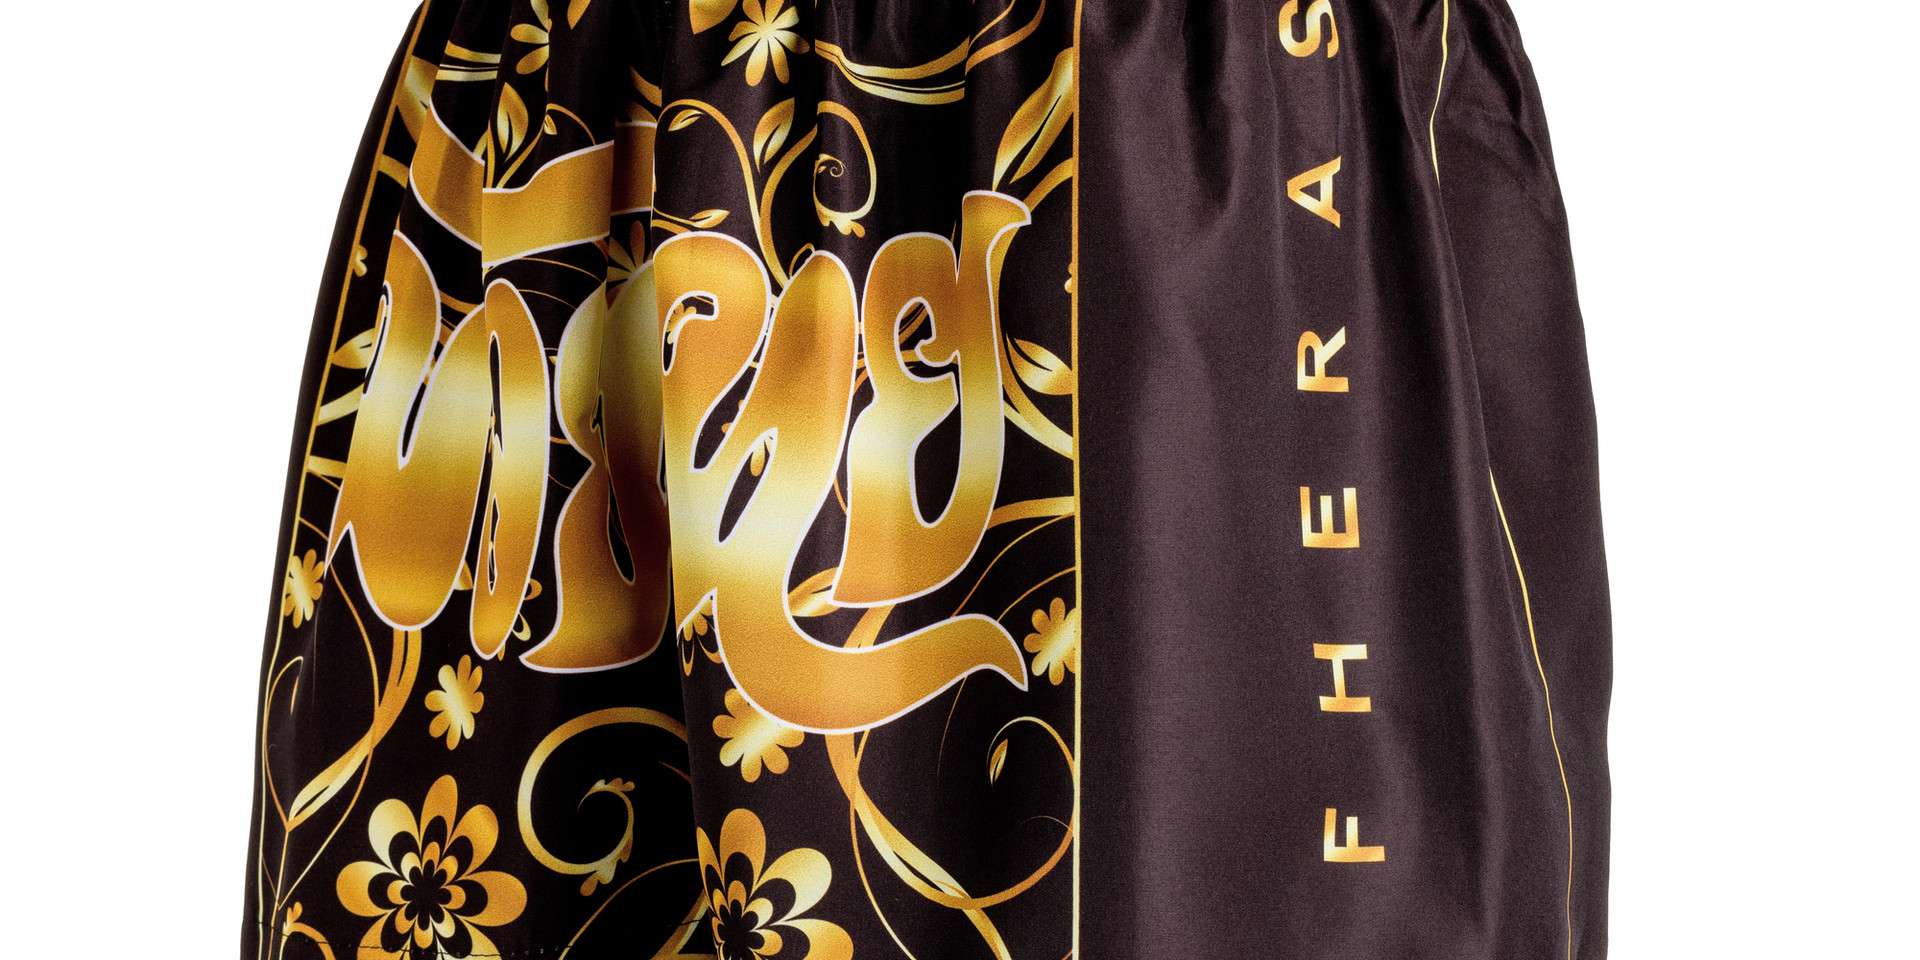 Shorts Fheras Flowers Gold Muay Thai